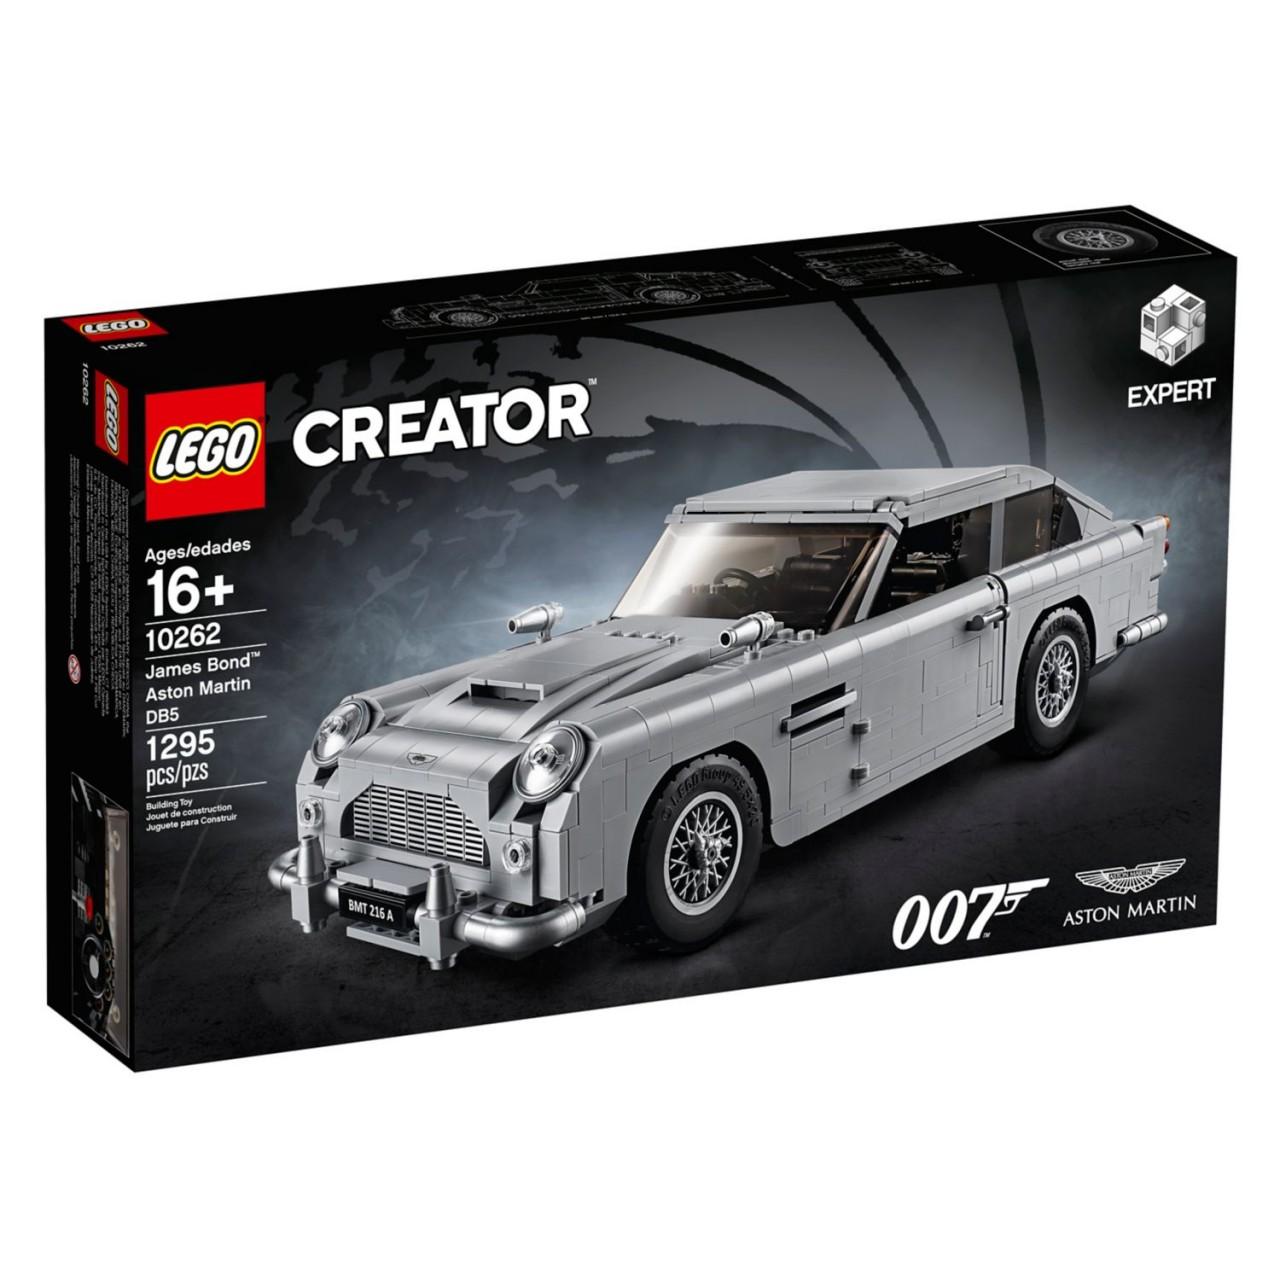 LEGO CREATOR 10262 James Bond Aston Martin DB5